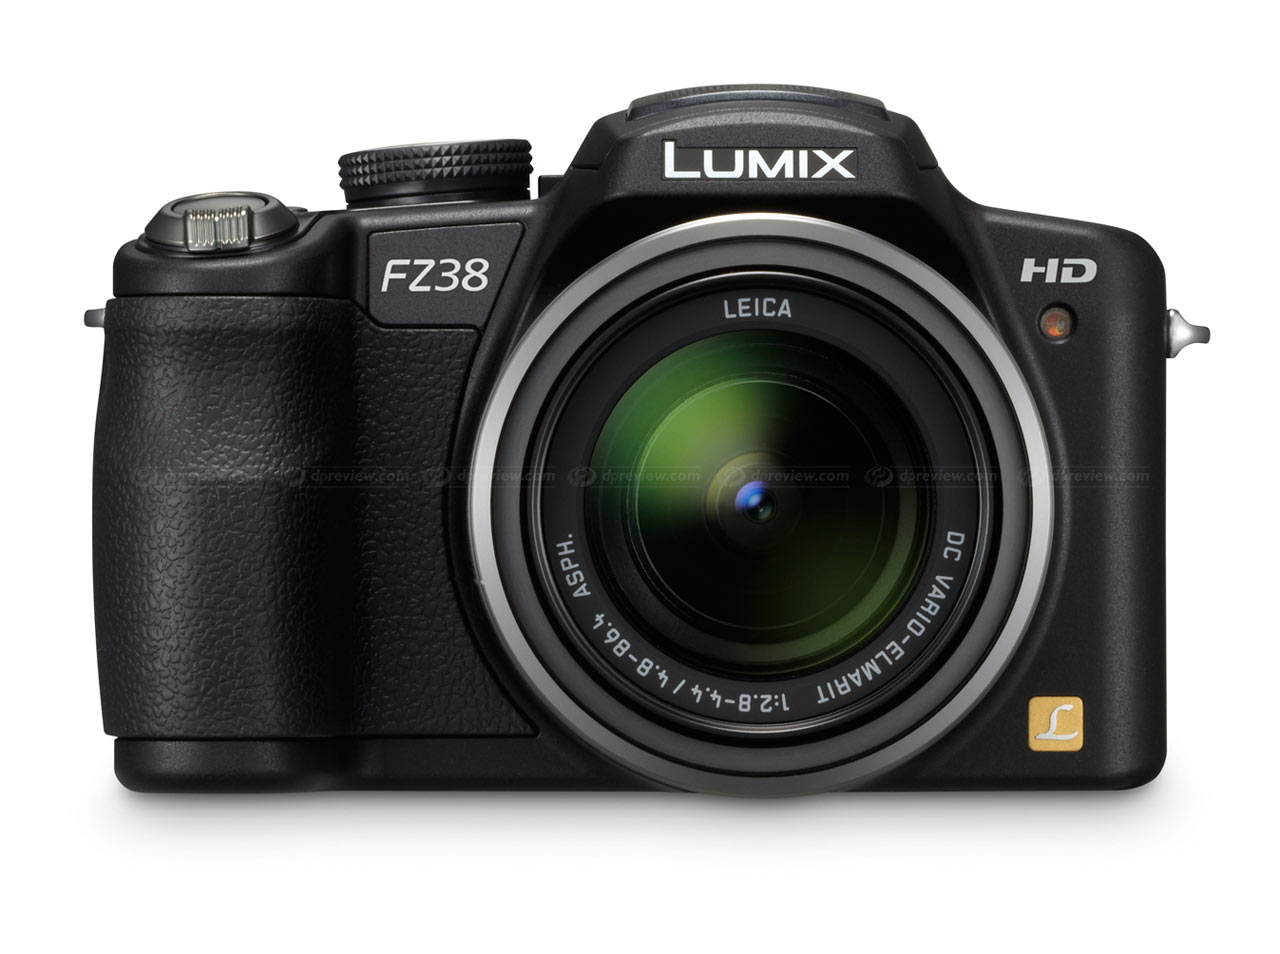 panasonic unveils lumix dmc fz35 fz38 super zoom digital rh dpreview com Chilton Manuals Parts Manual